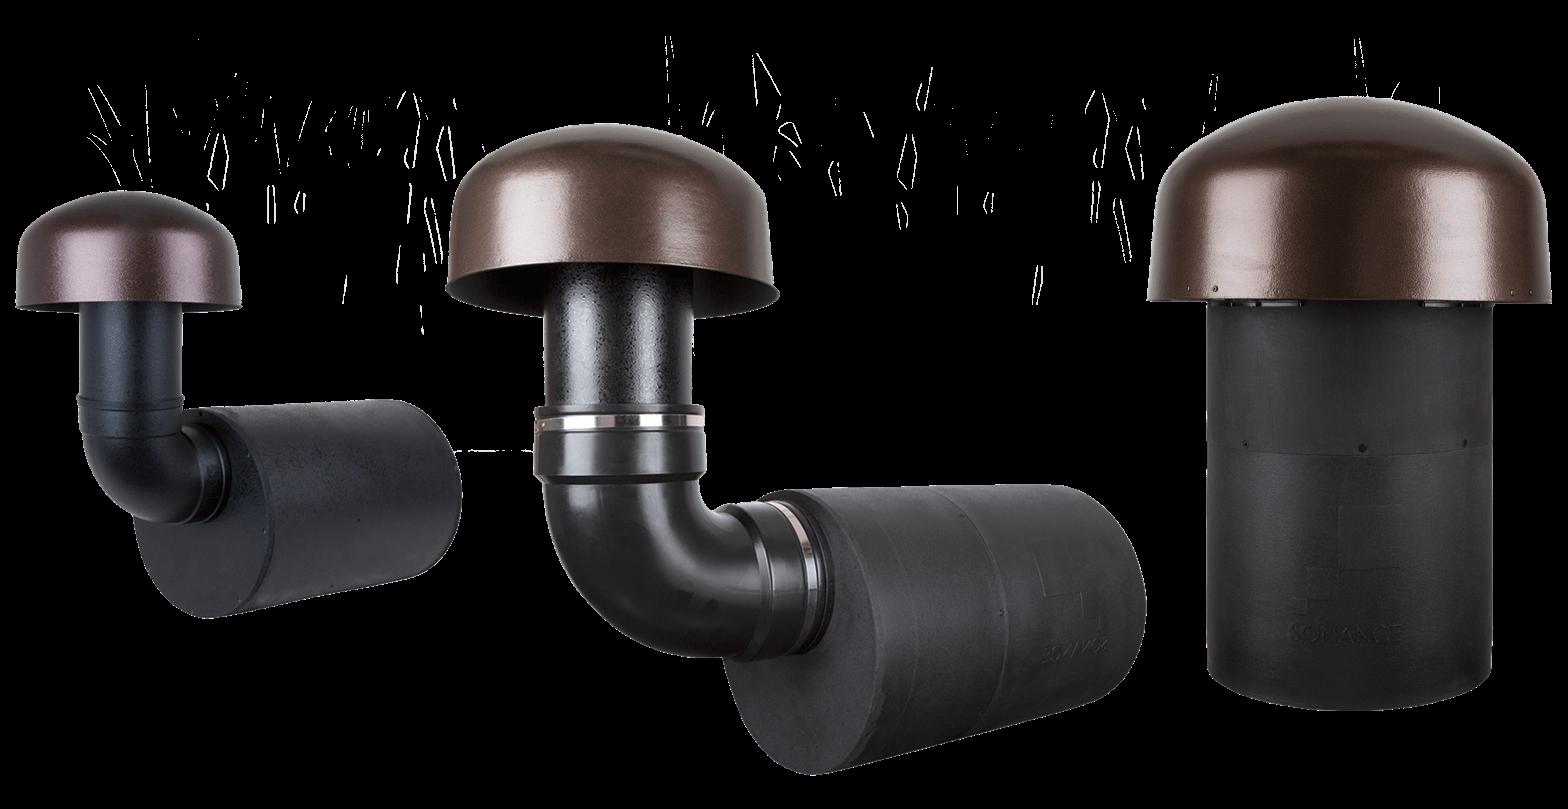 Sonance Landscape Speaker System Below-ground Subwoofers